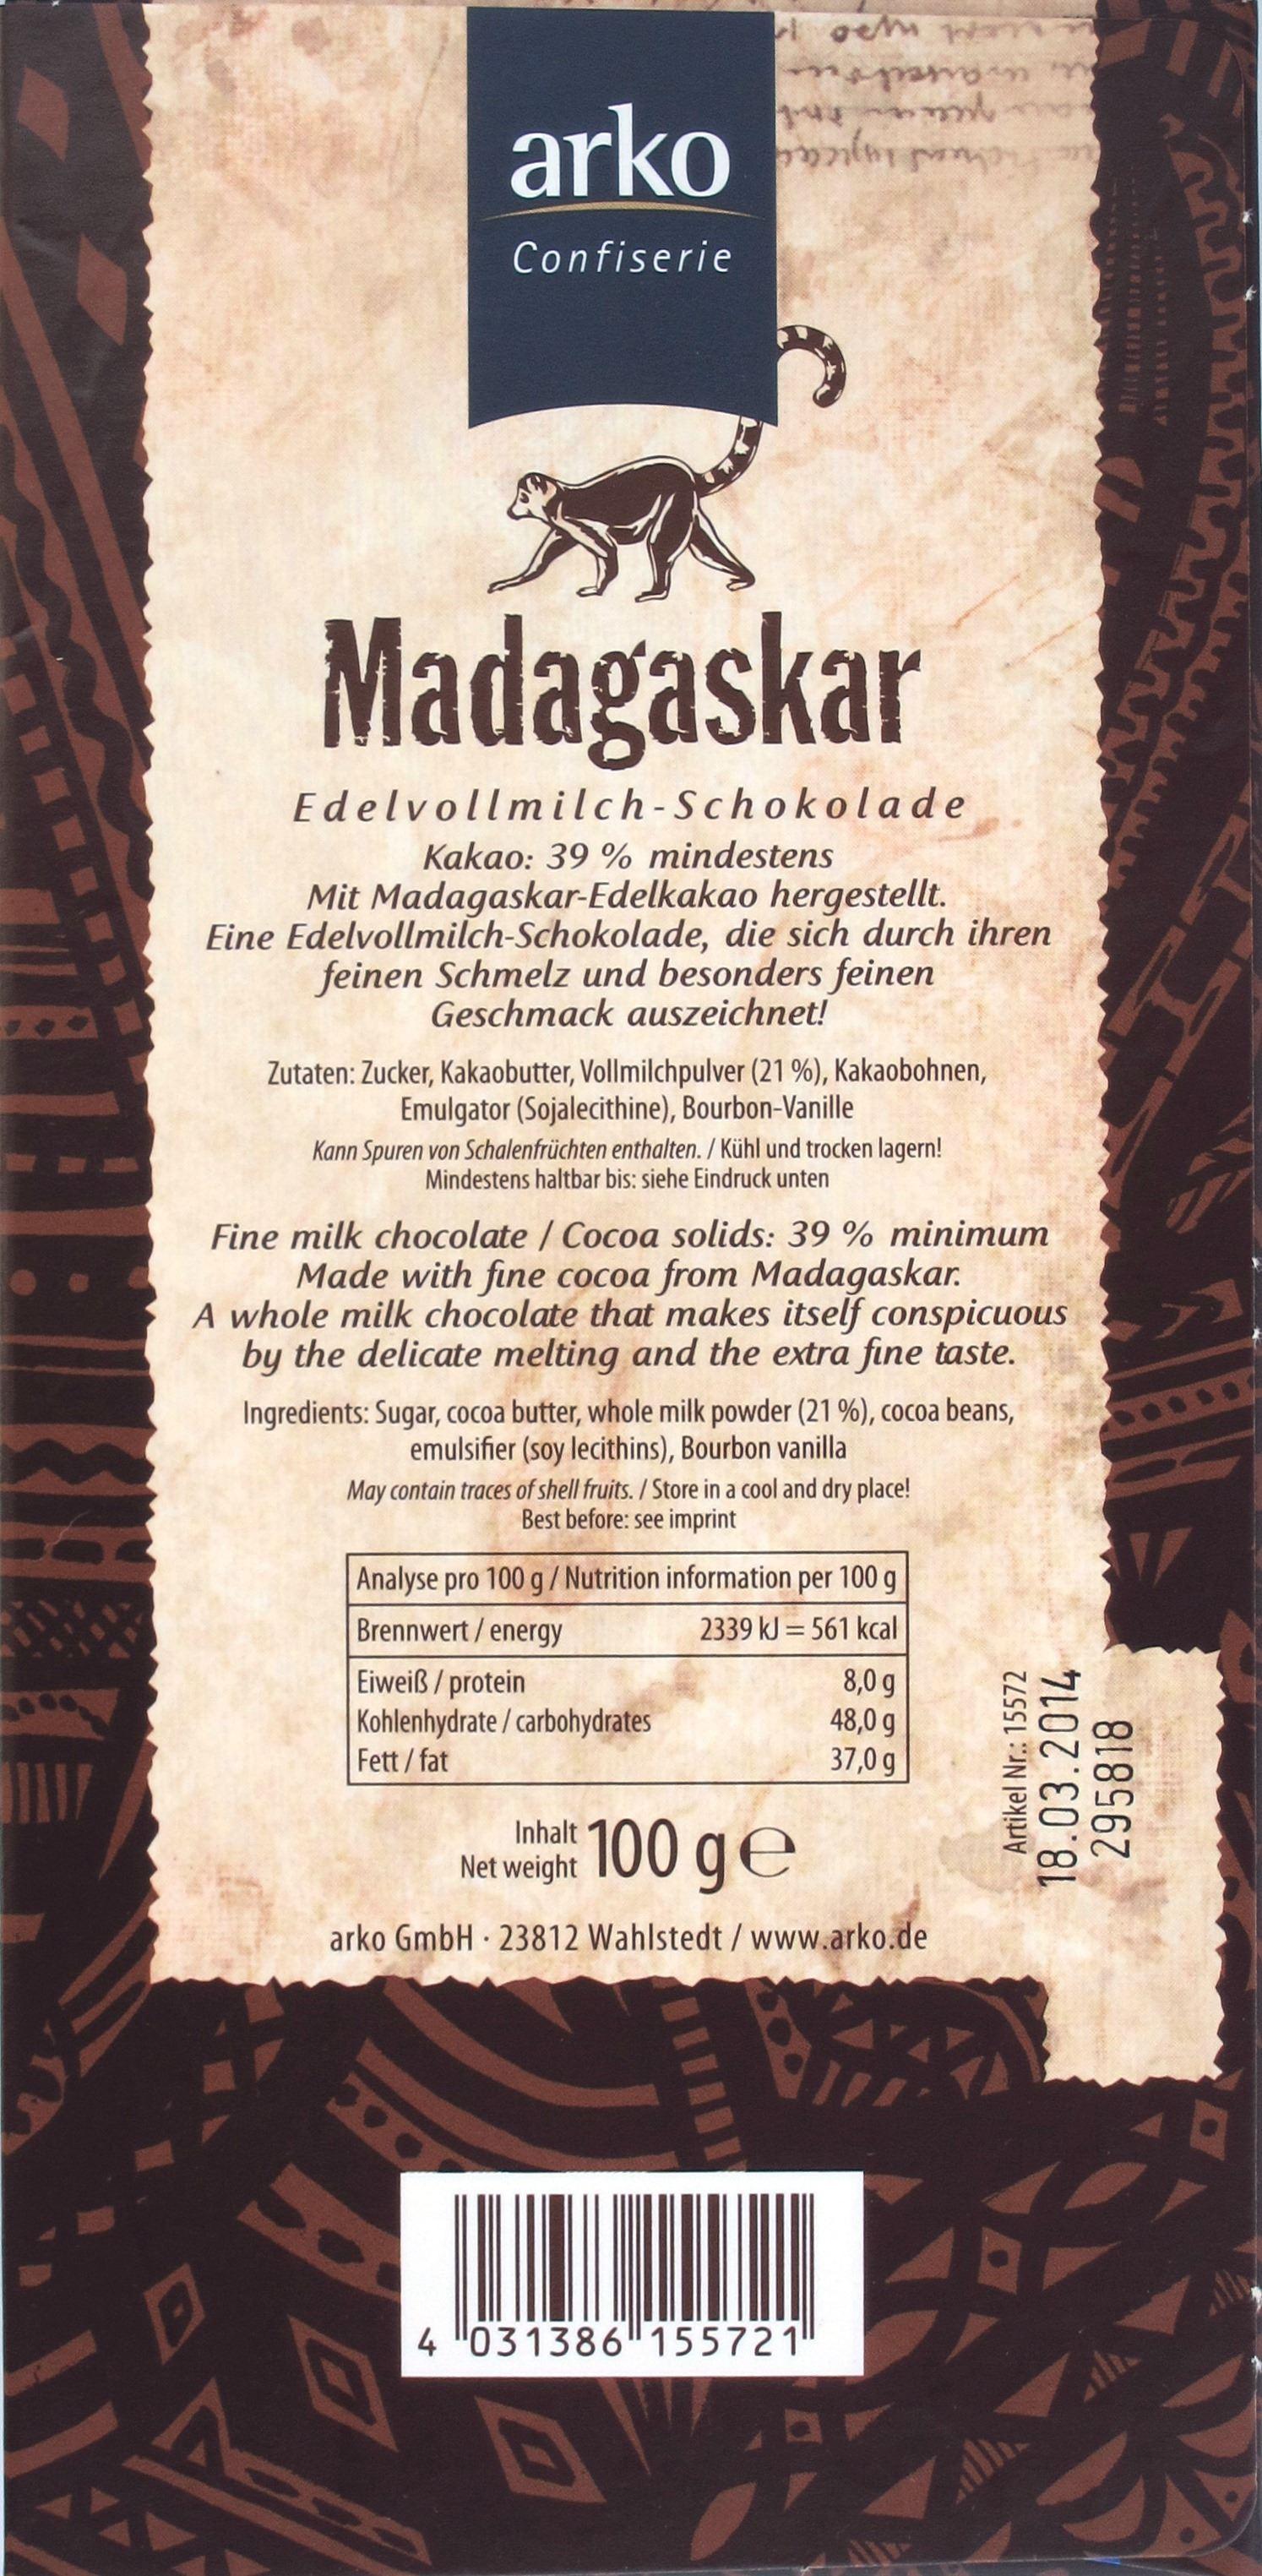 Arko, Madagaskar, 39%, Milchschokolade, Packungsrückseite